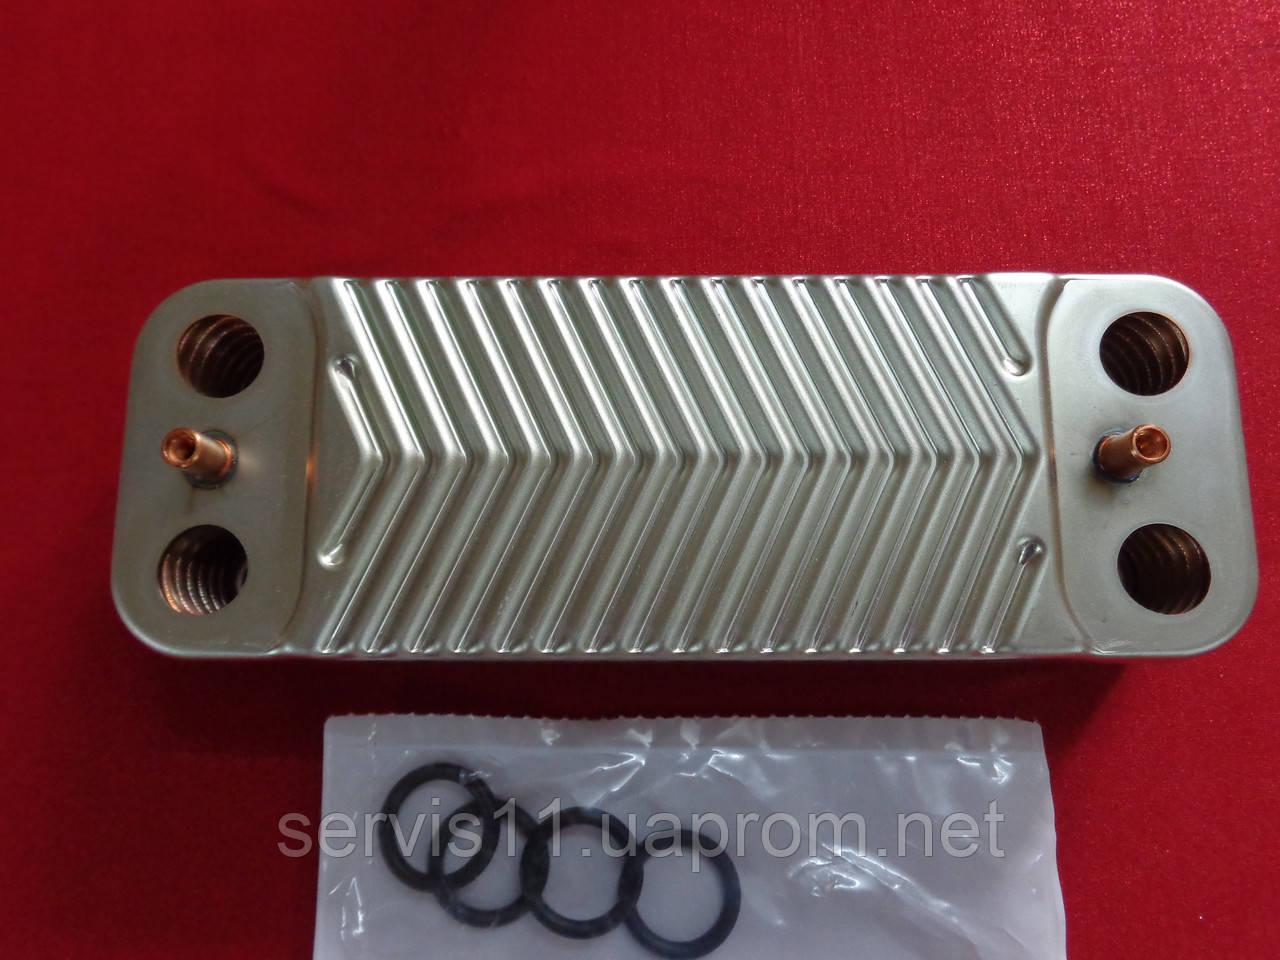 Теплообменник Protherm Tiger 24ktv12, 24kov12